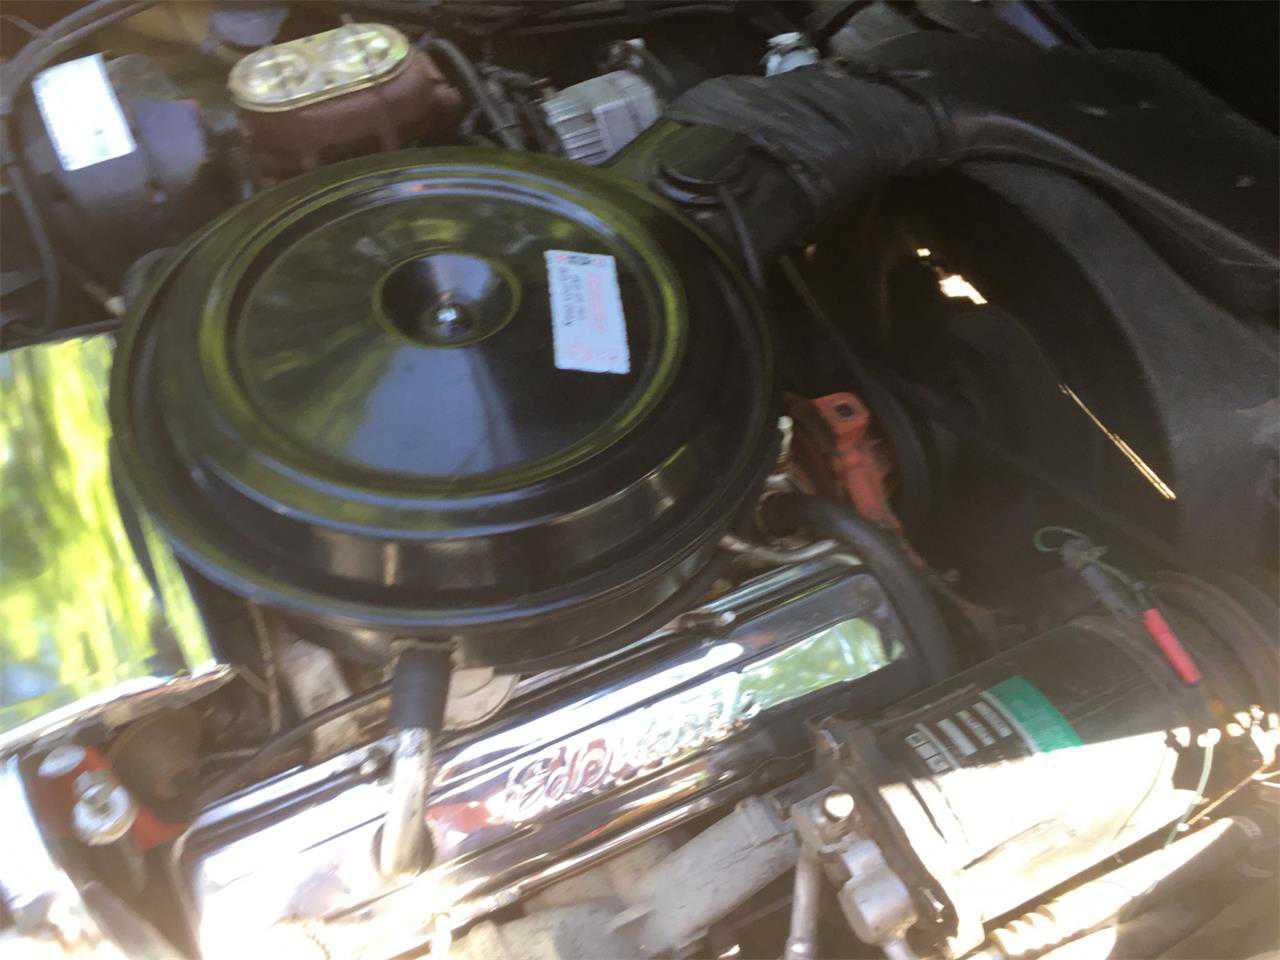 1976 Chevrolet Corvette For Sale In Annandale Mn 1z37l65436329 Chevy Fuel System Prev